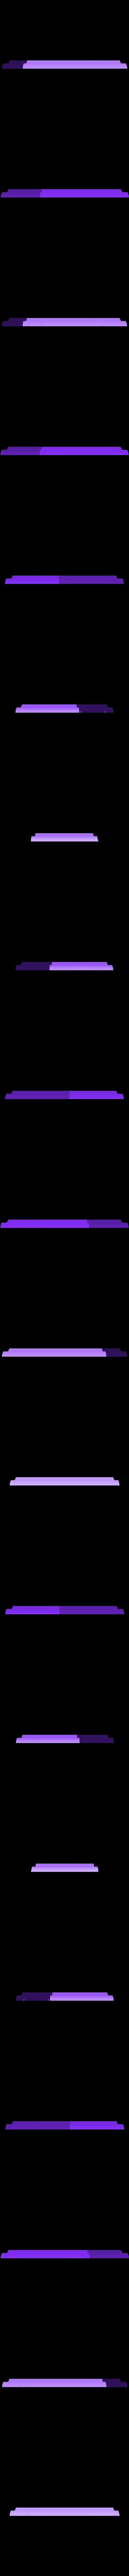 Tapion's Music Box - Top Empty.stl Télécharger fichier STL Tapion Music Box - Dragon Ball • Plan pour impression 3D, BODY3D